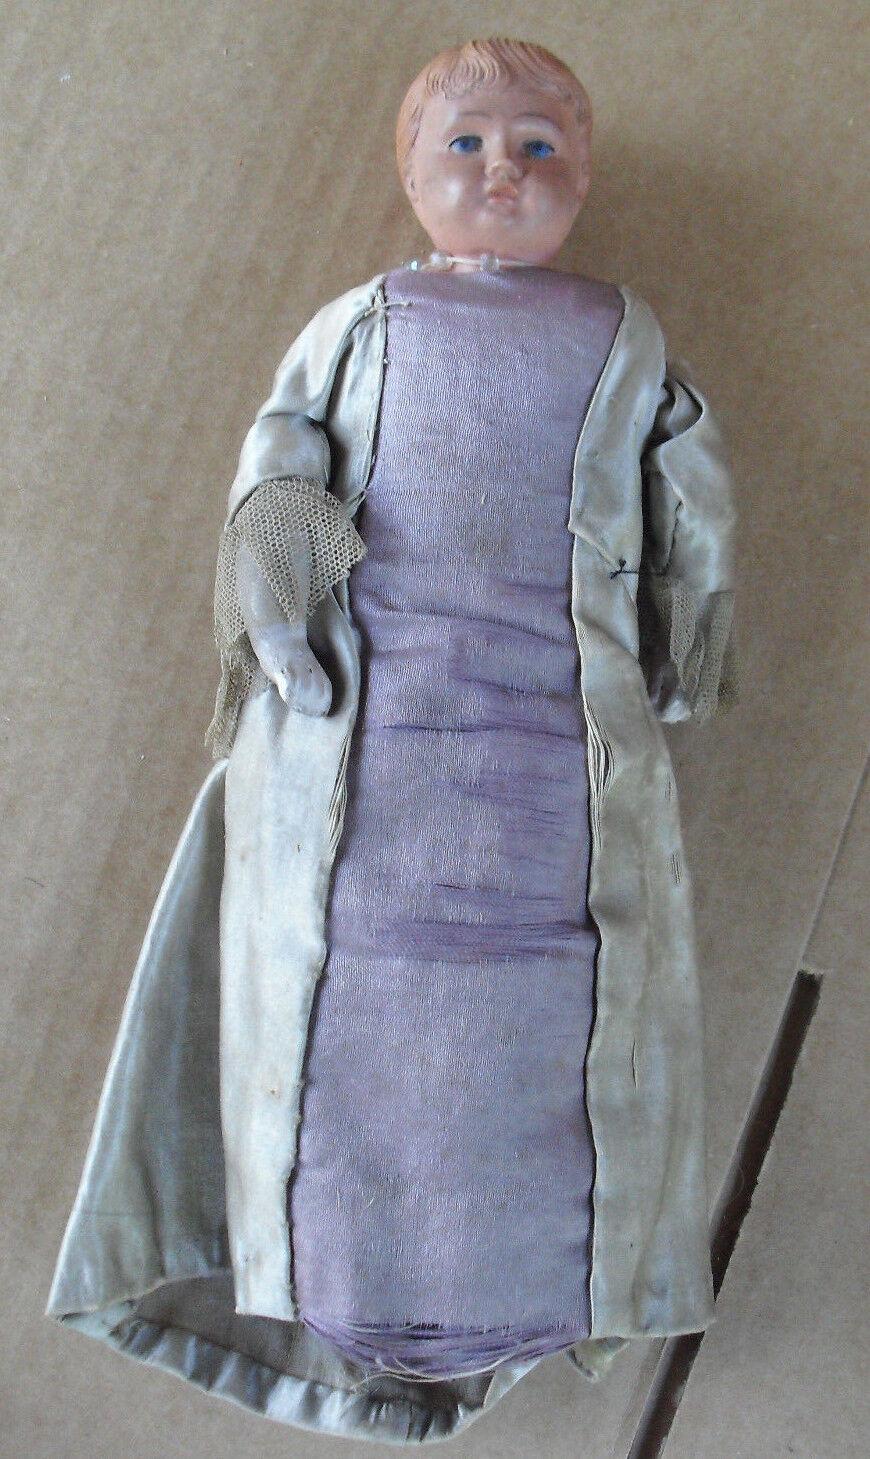 RARE Antique Celluloid Head Cloth  regina Elizabeth bambola 10  Ttutti guarda  clienti prima reputazione prima